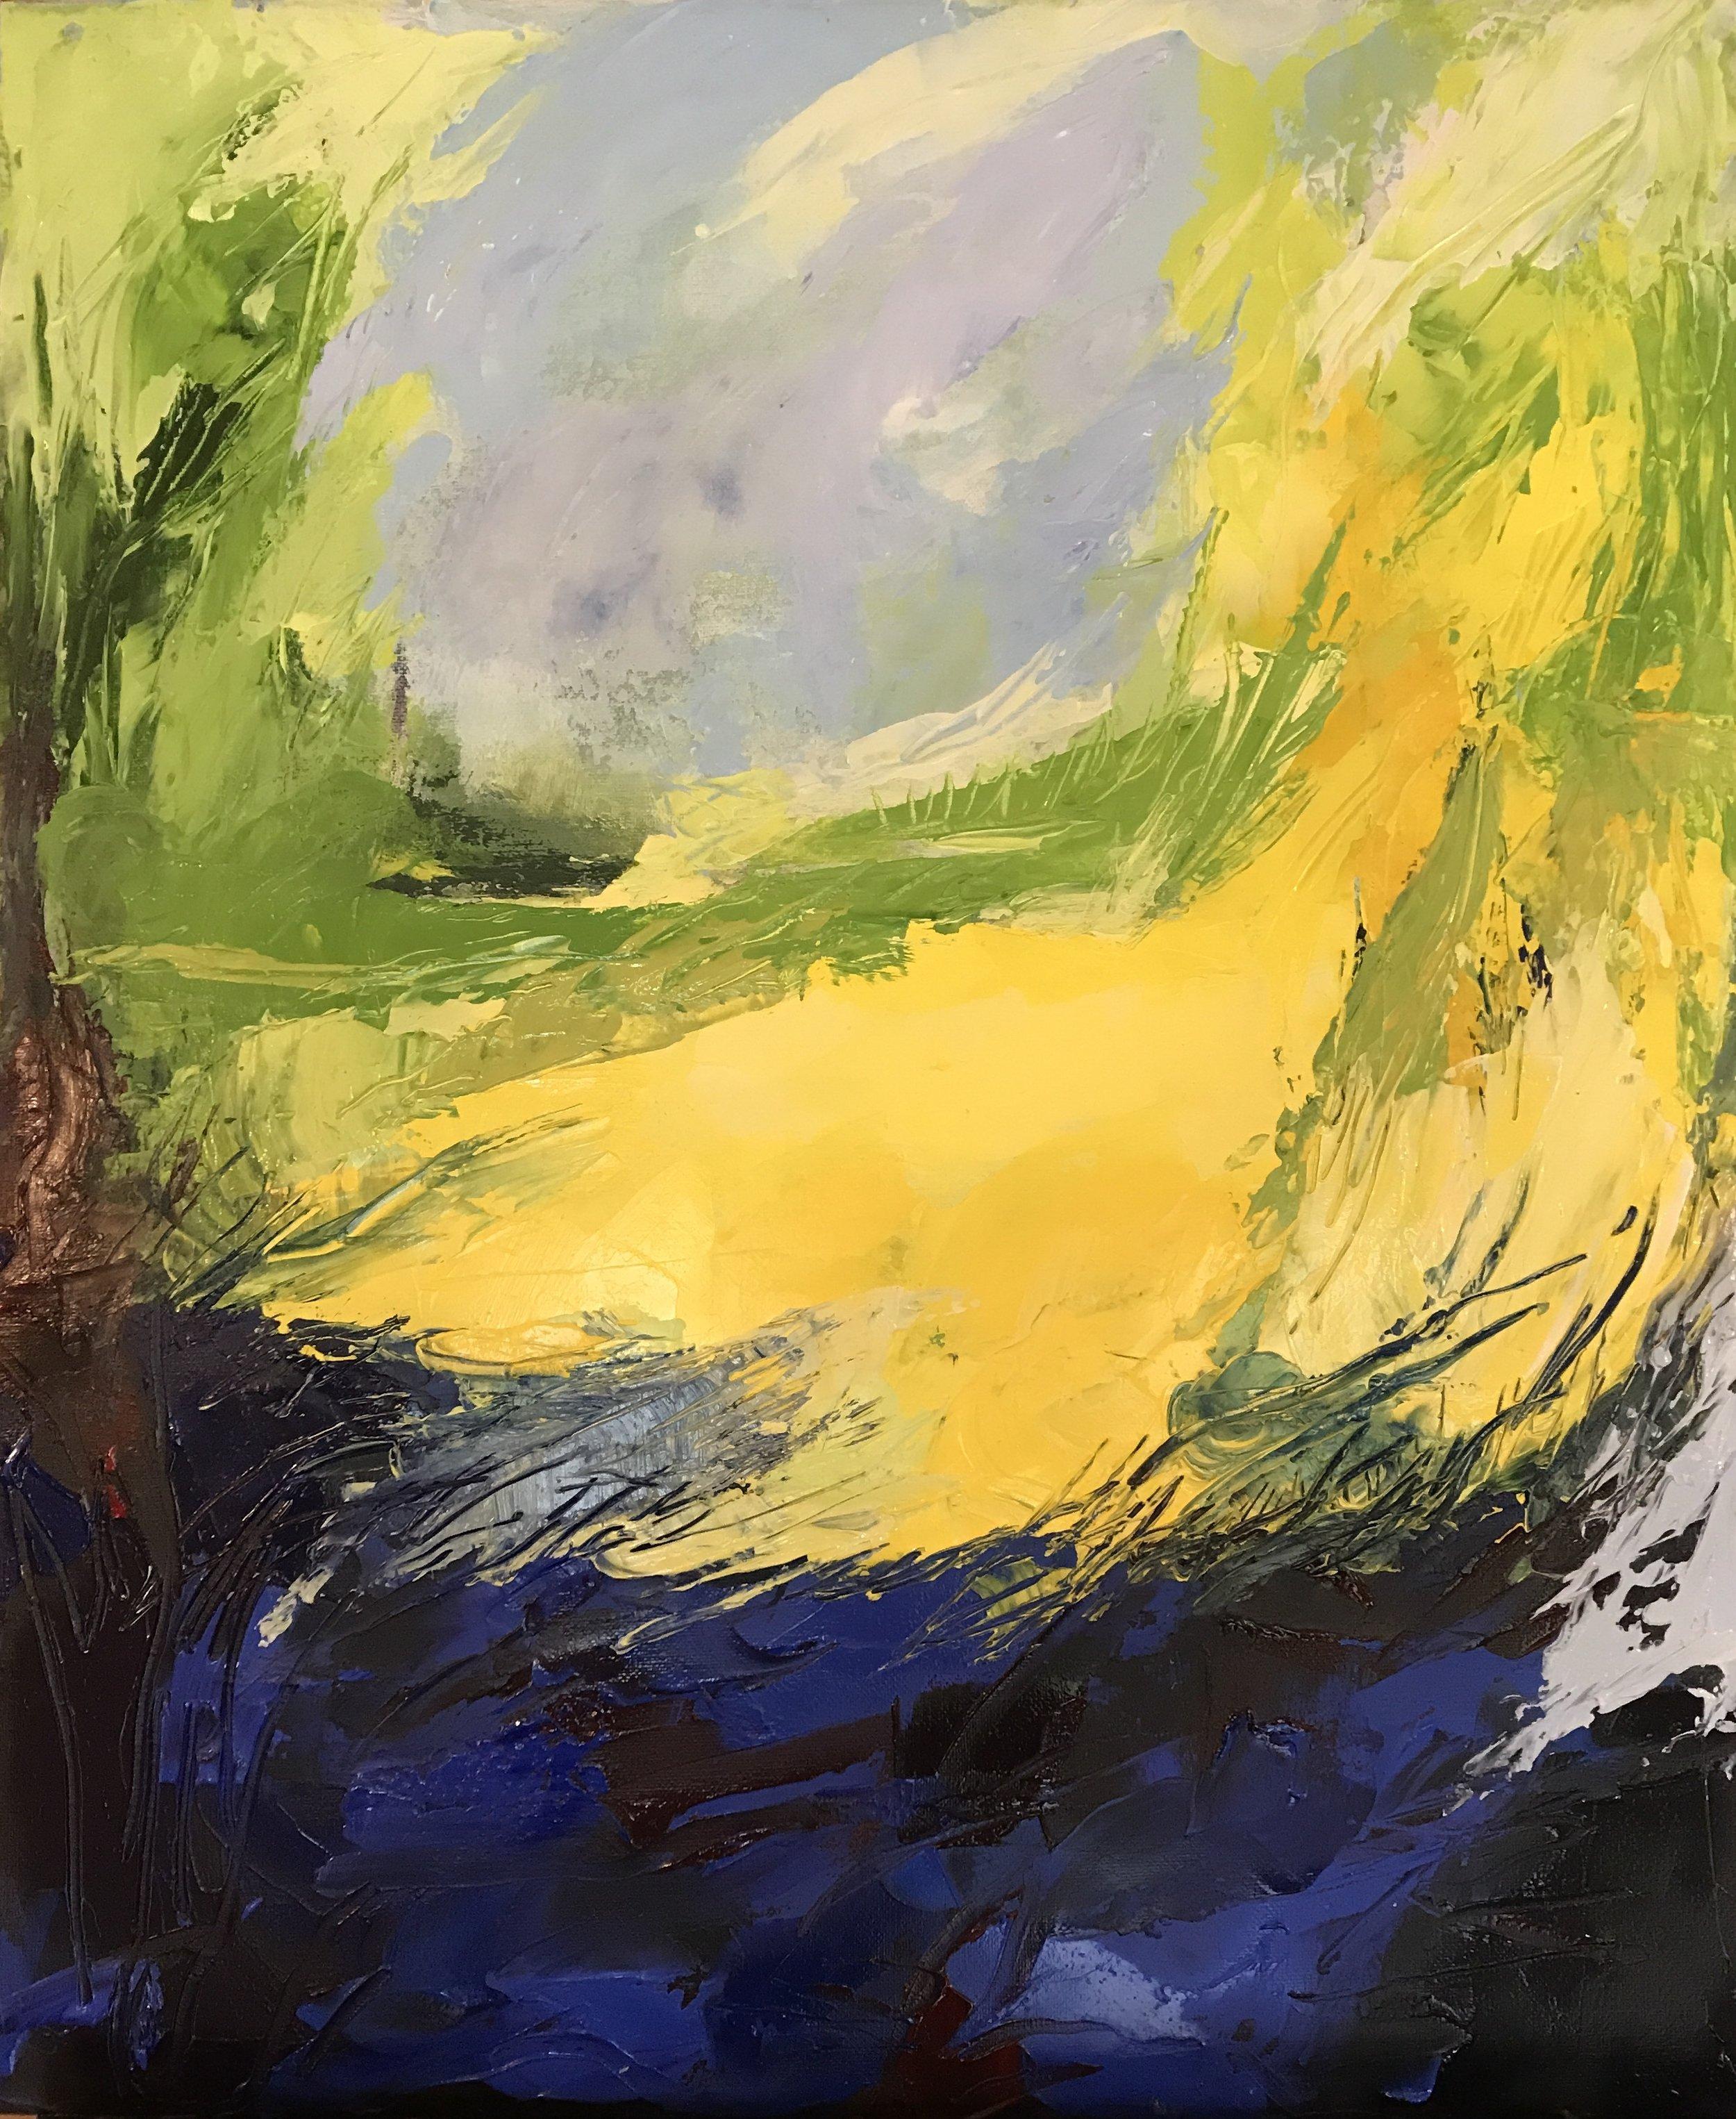 Spring-Otford Hills - acrylic on canvas  50x60cm £350